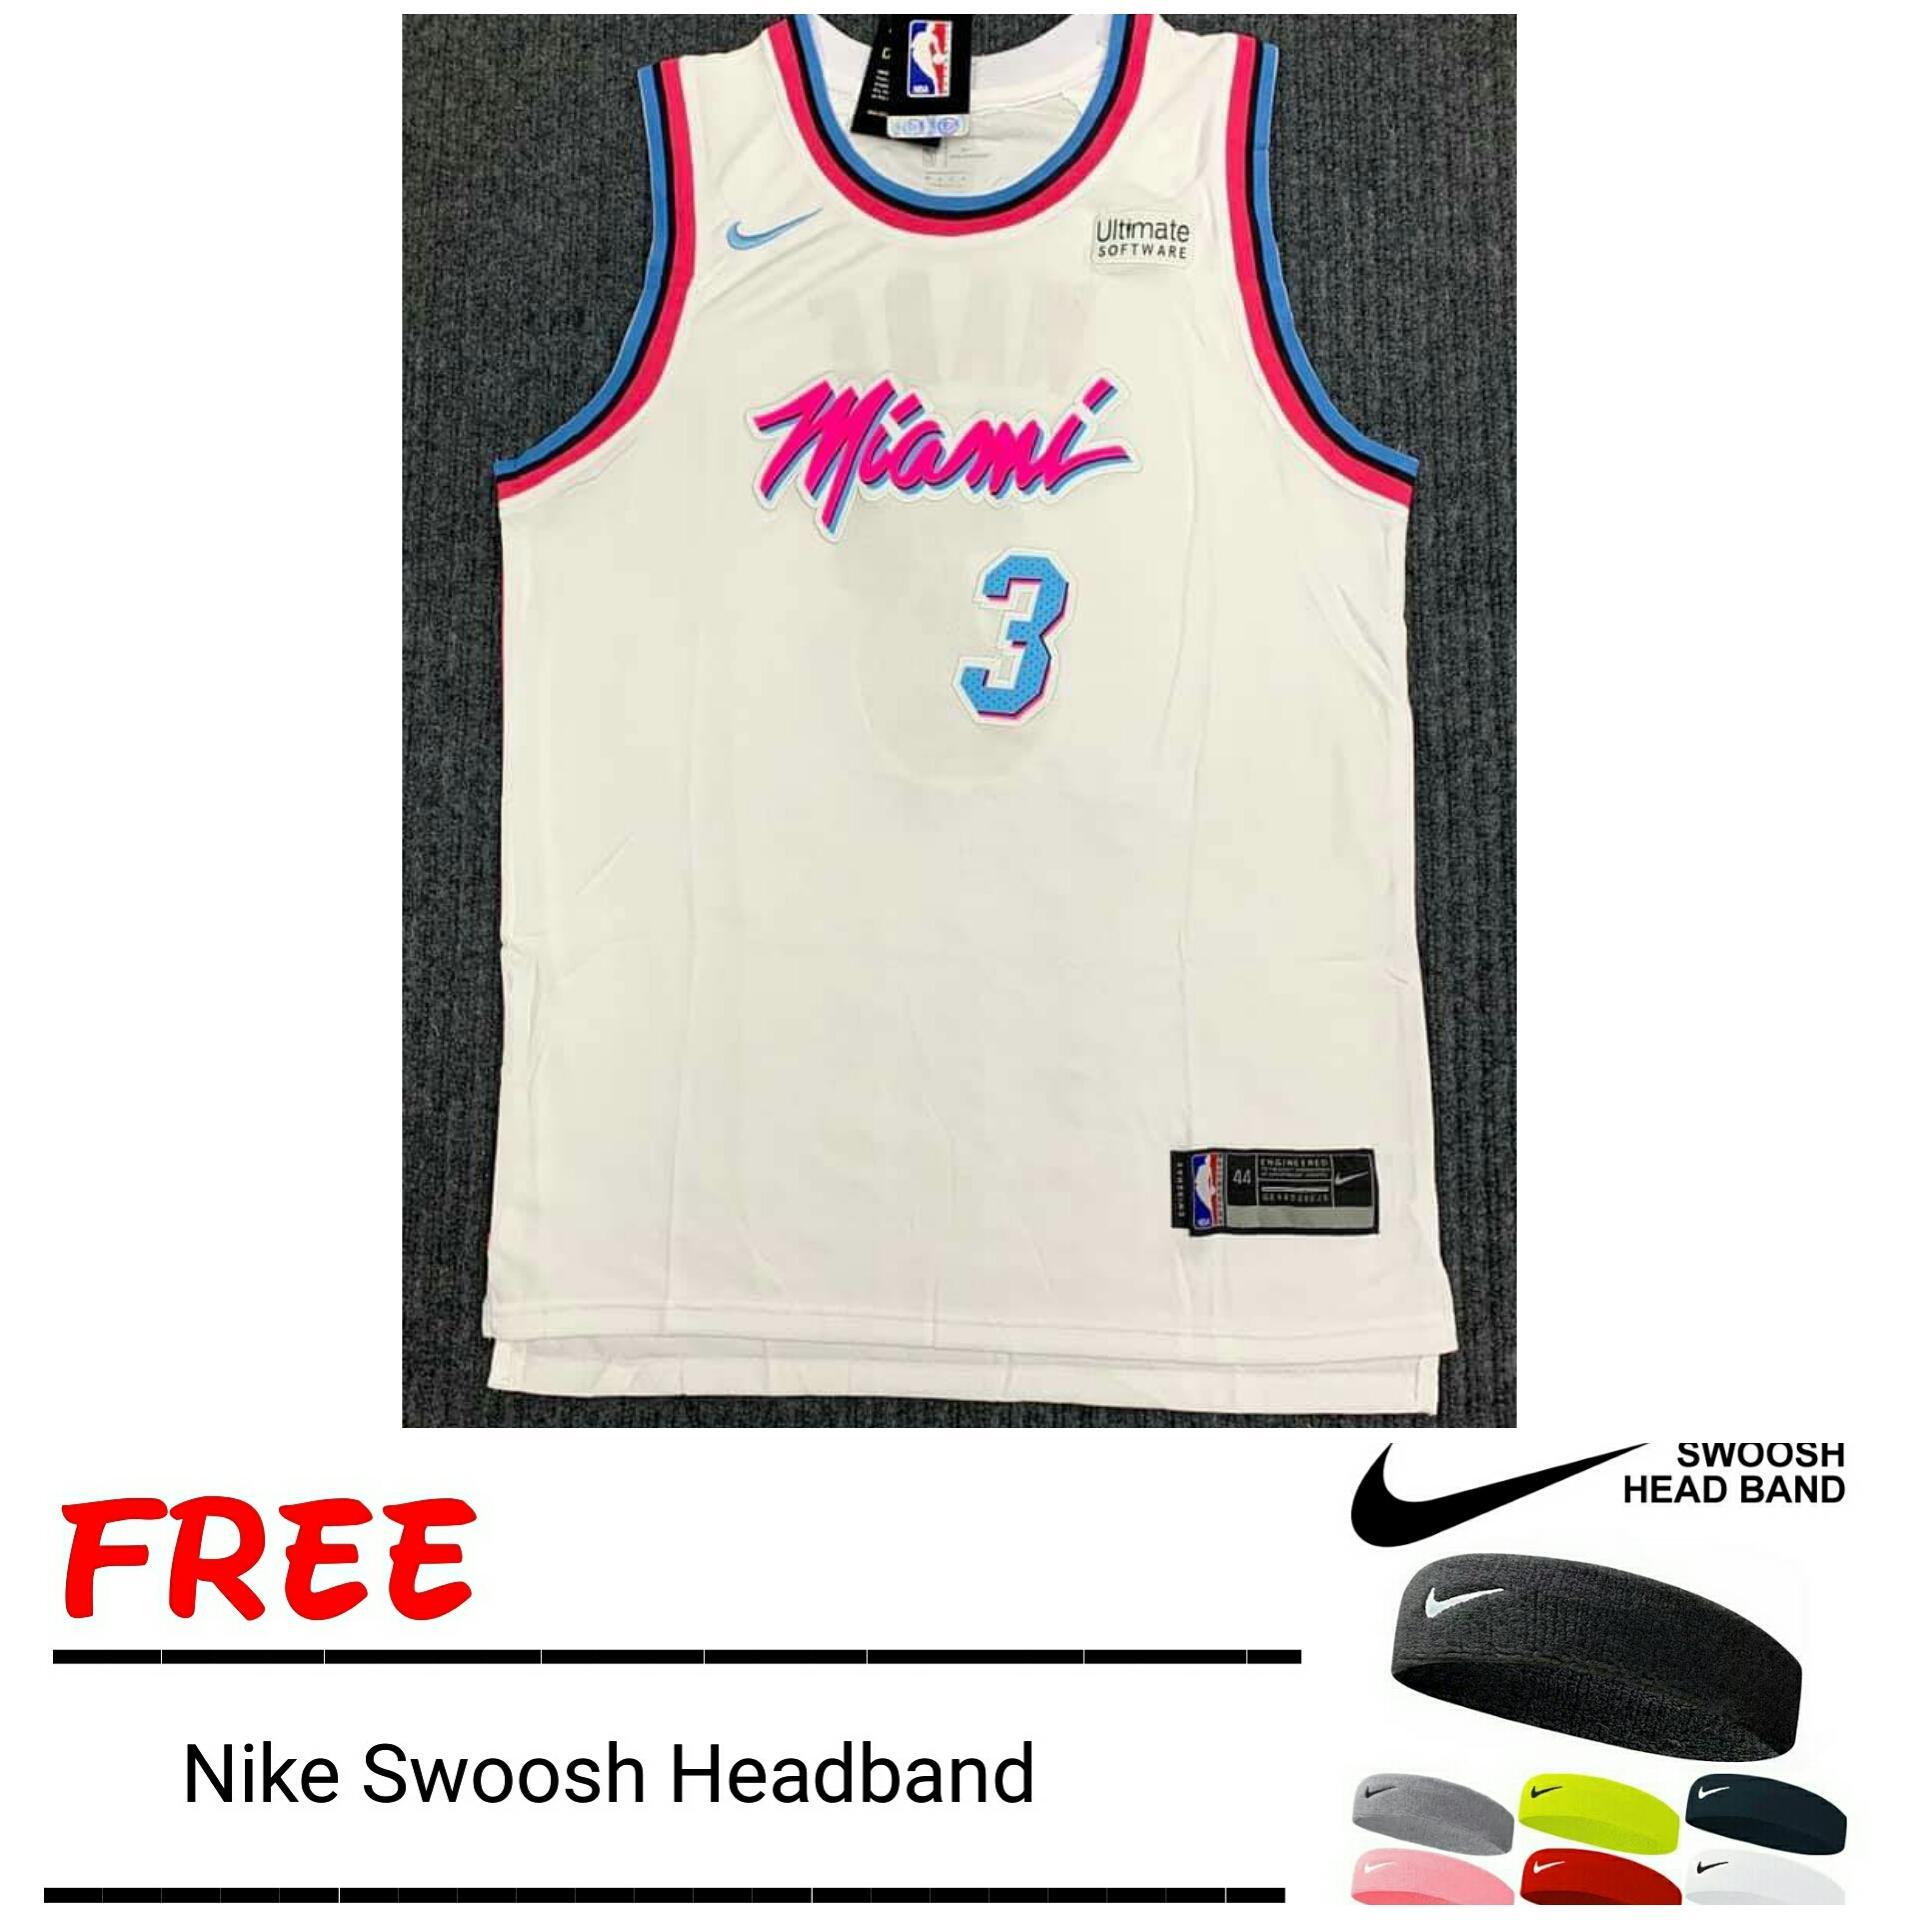 separation shoes f206d 5793b Dwayne Wade Miami Heat Jersey